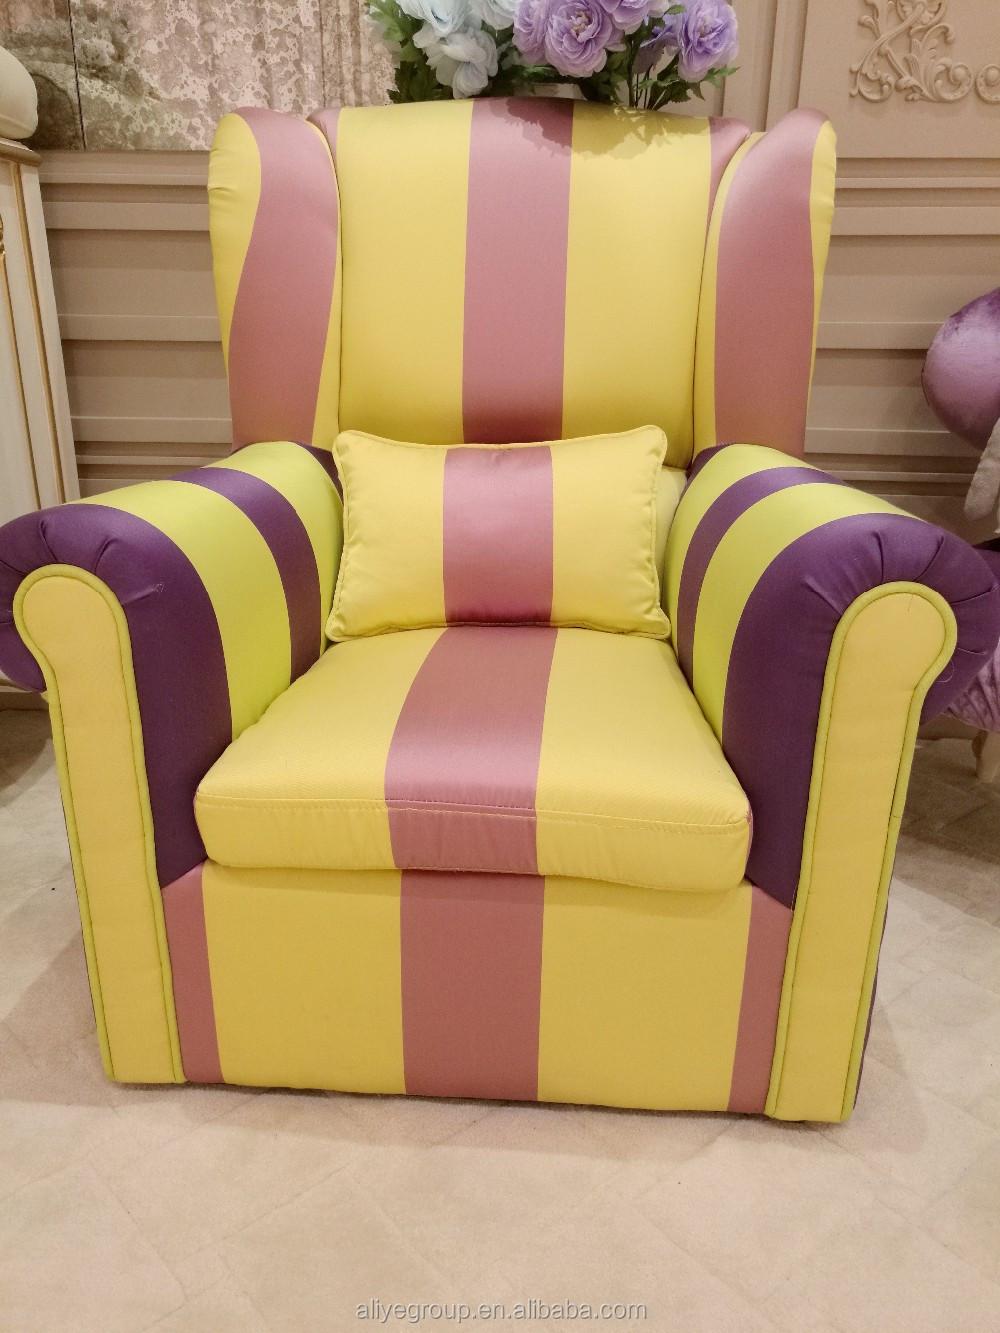 Wy504 children Sofa colourful Rainbow Fabric Kid Sofa Chair Buy